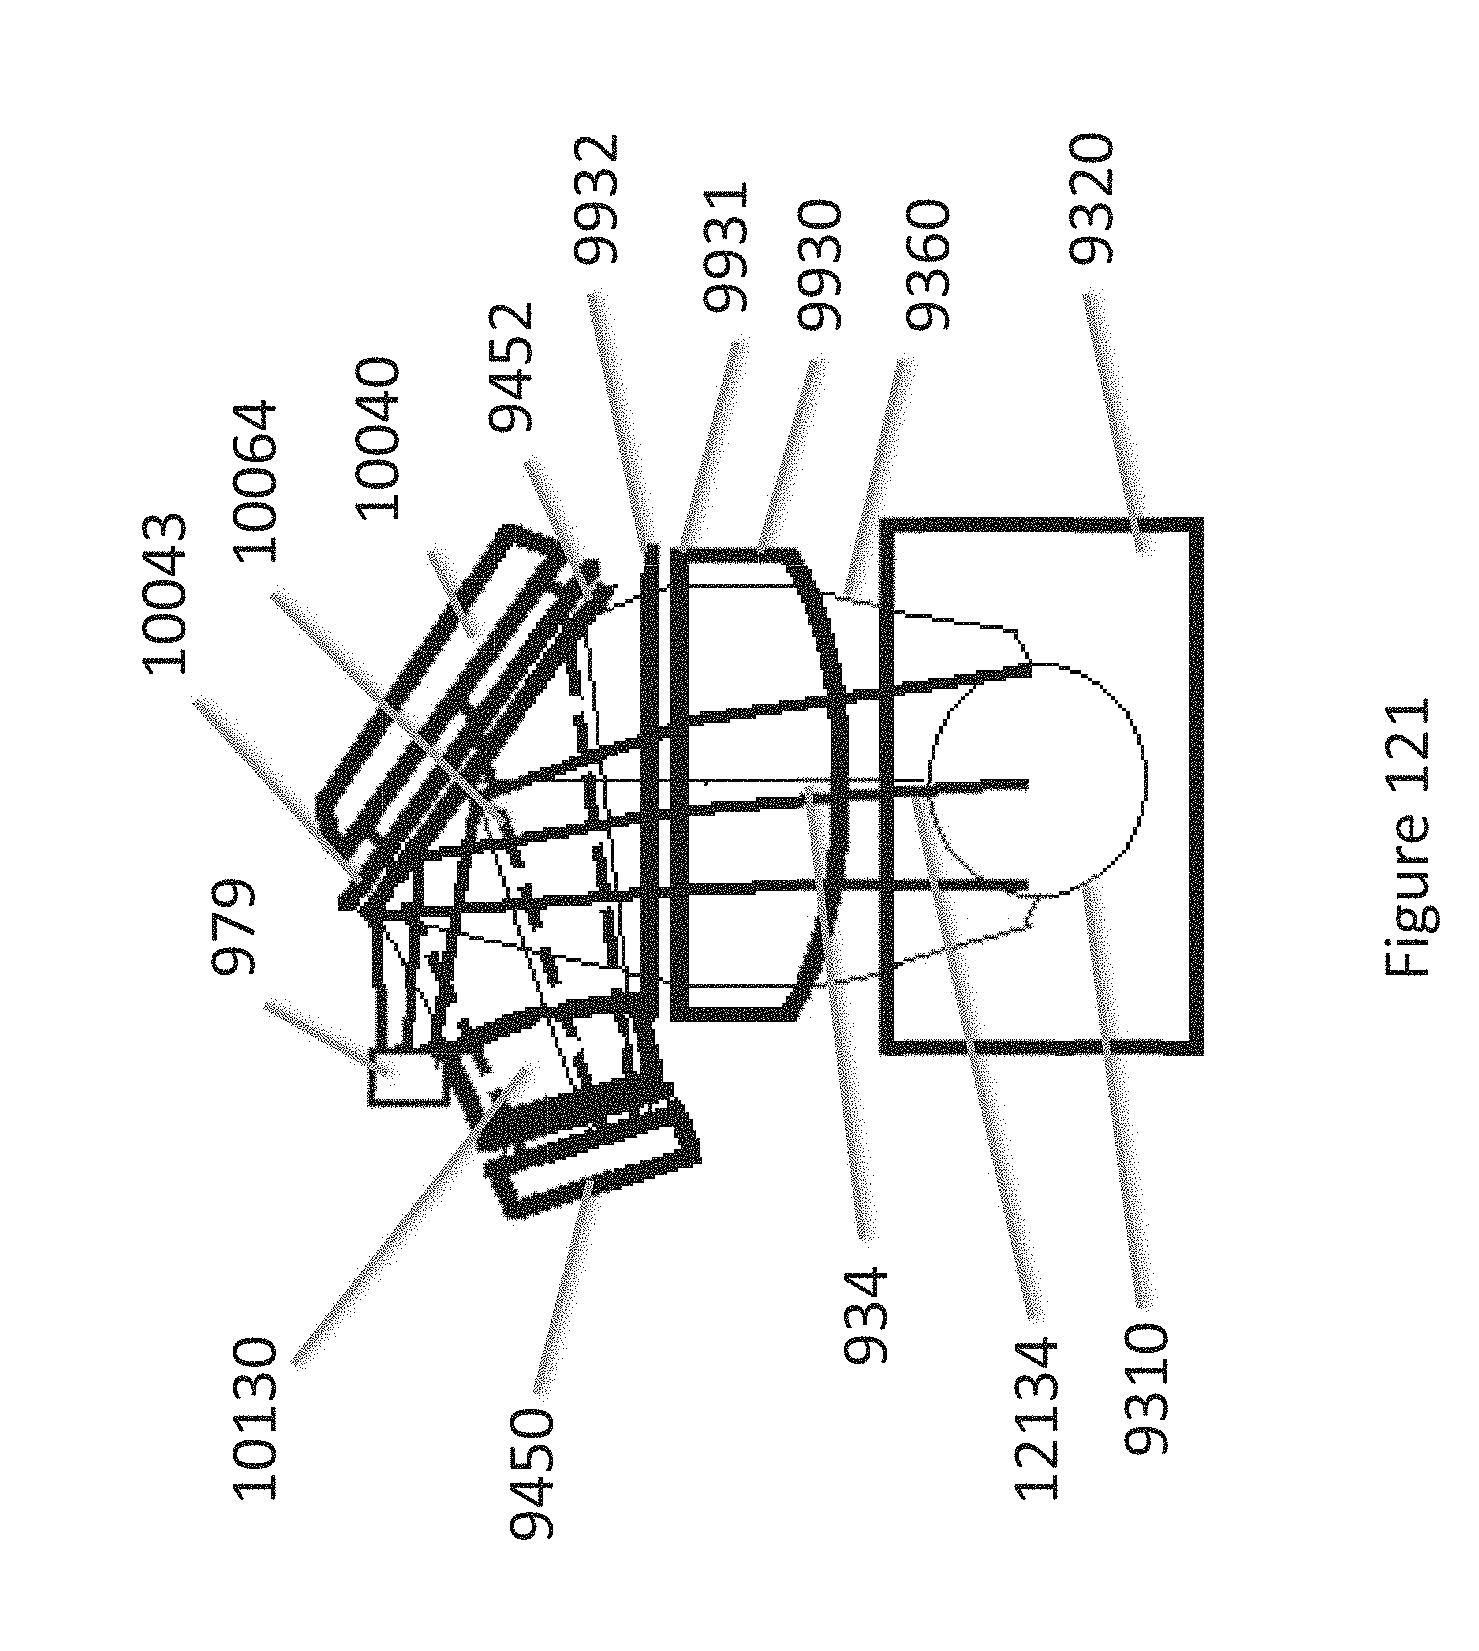 Patent US 9,740,012 B2